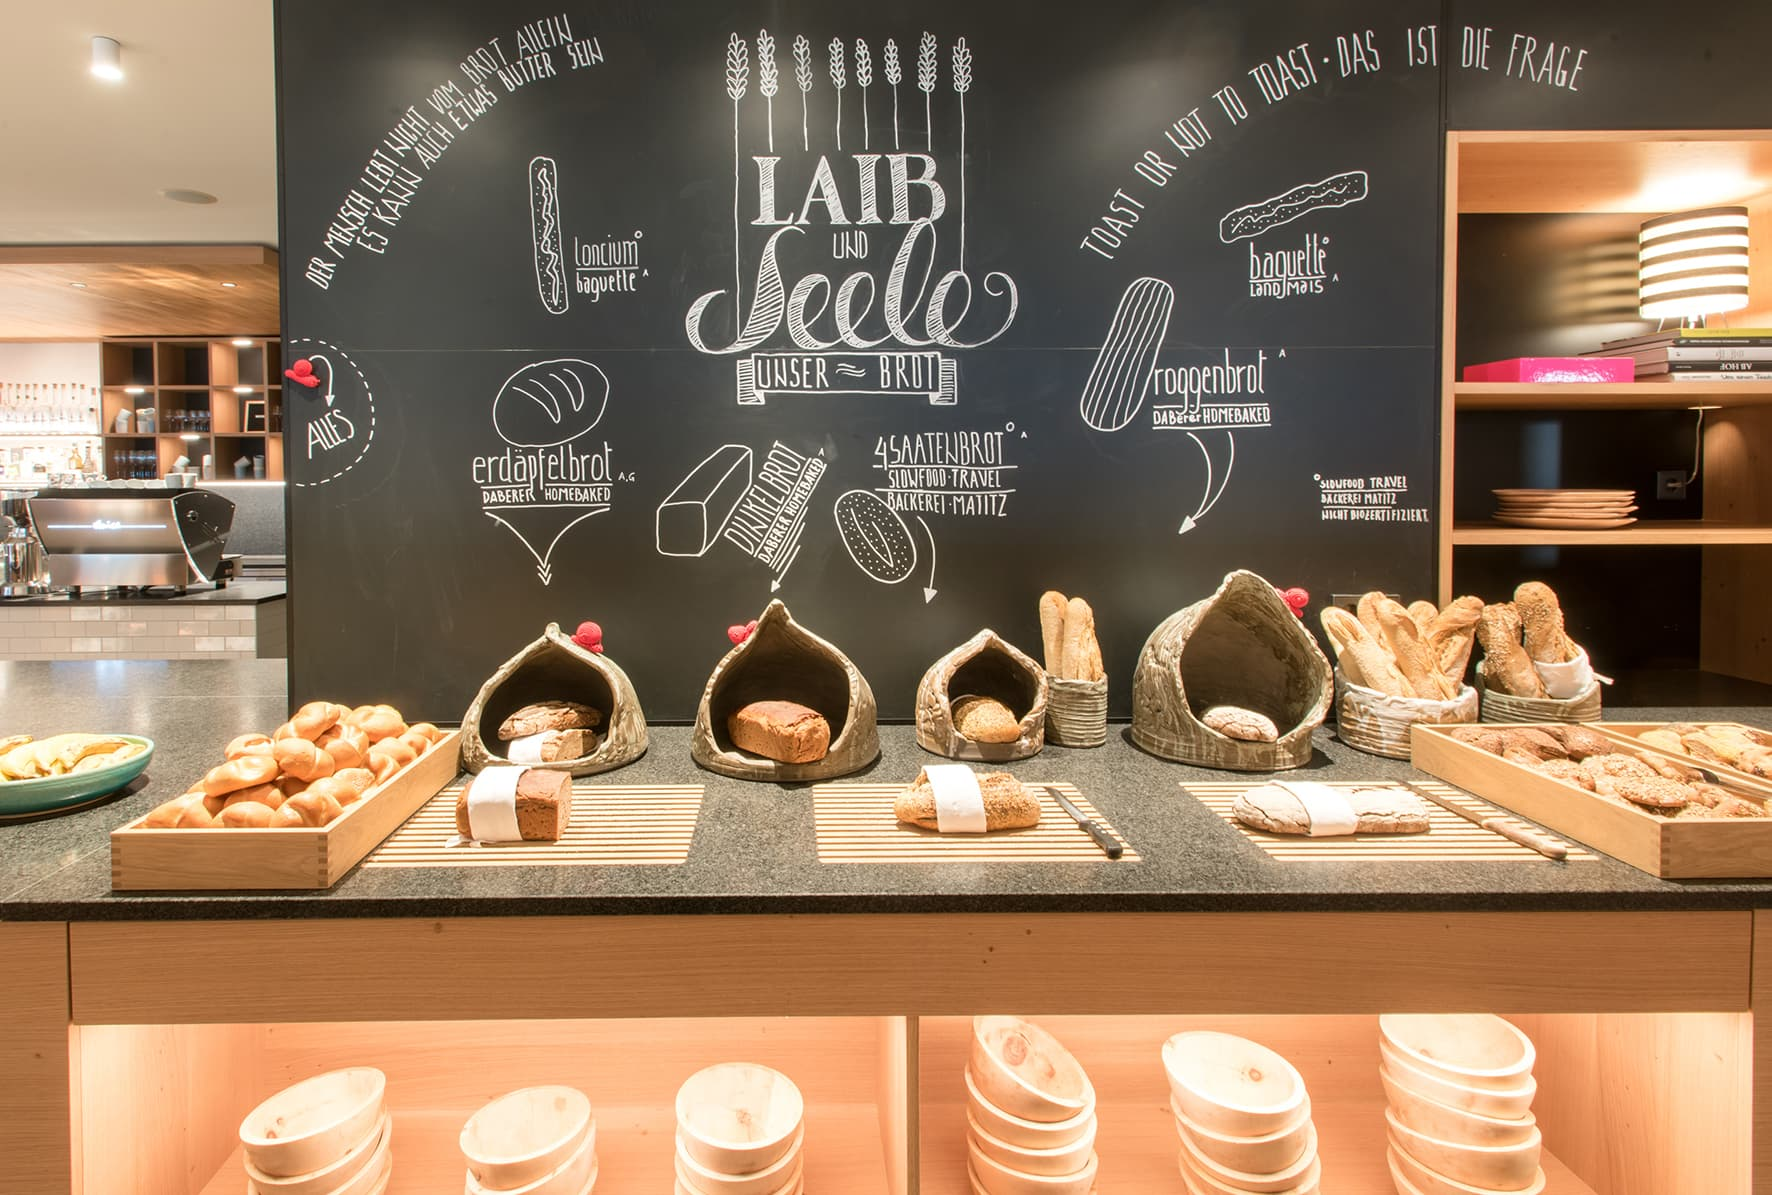 Laib und Seele Frühstück